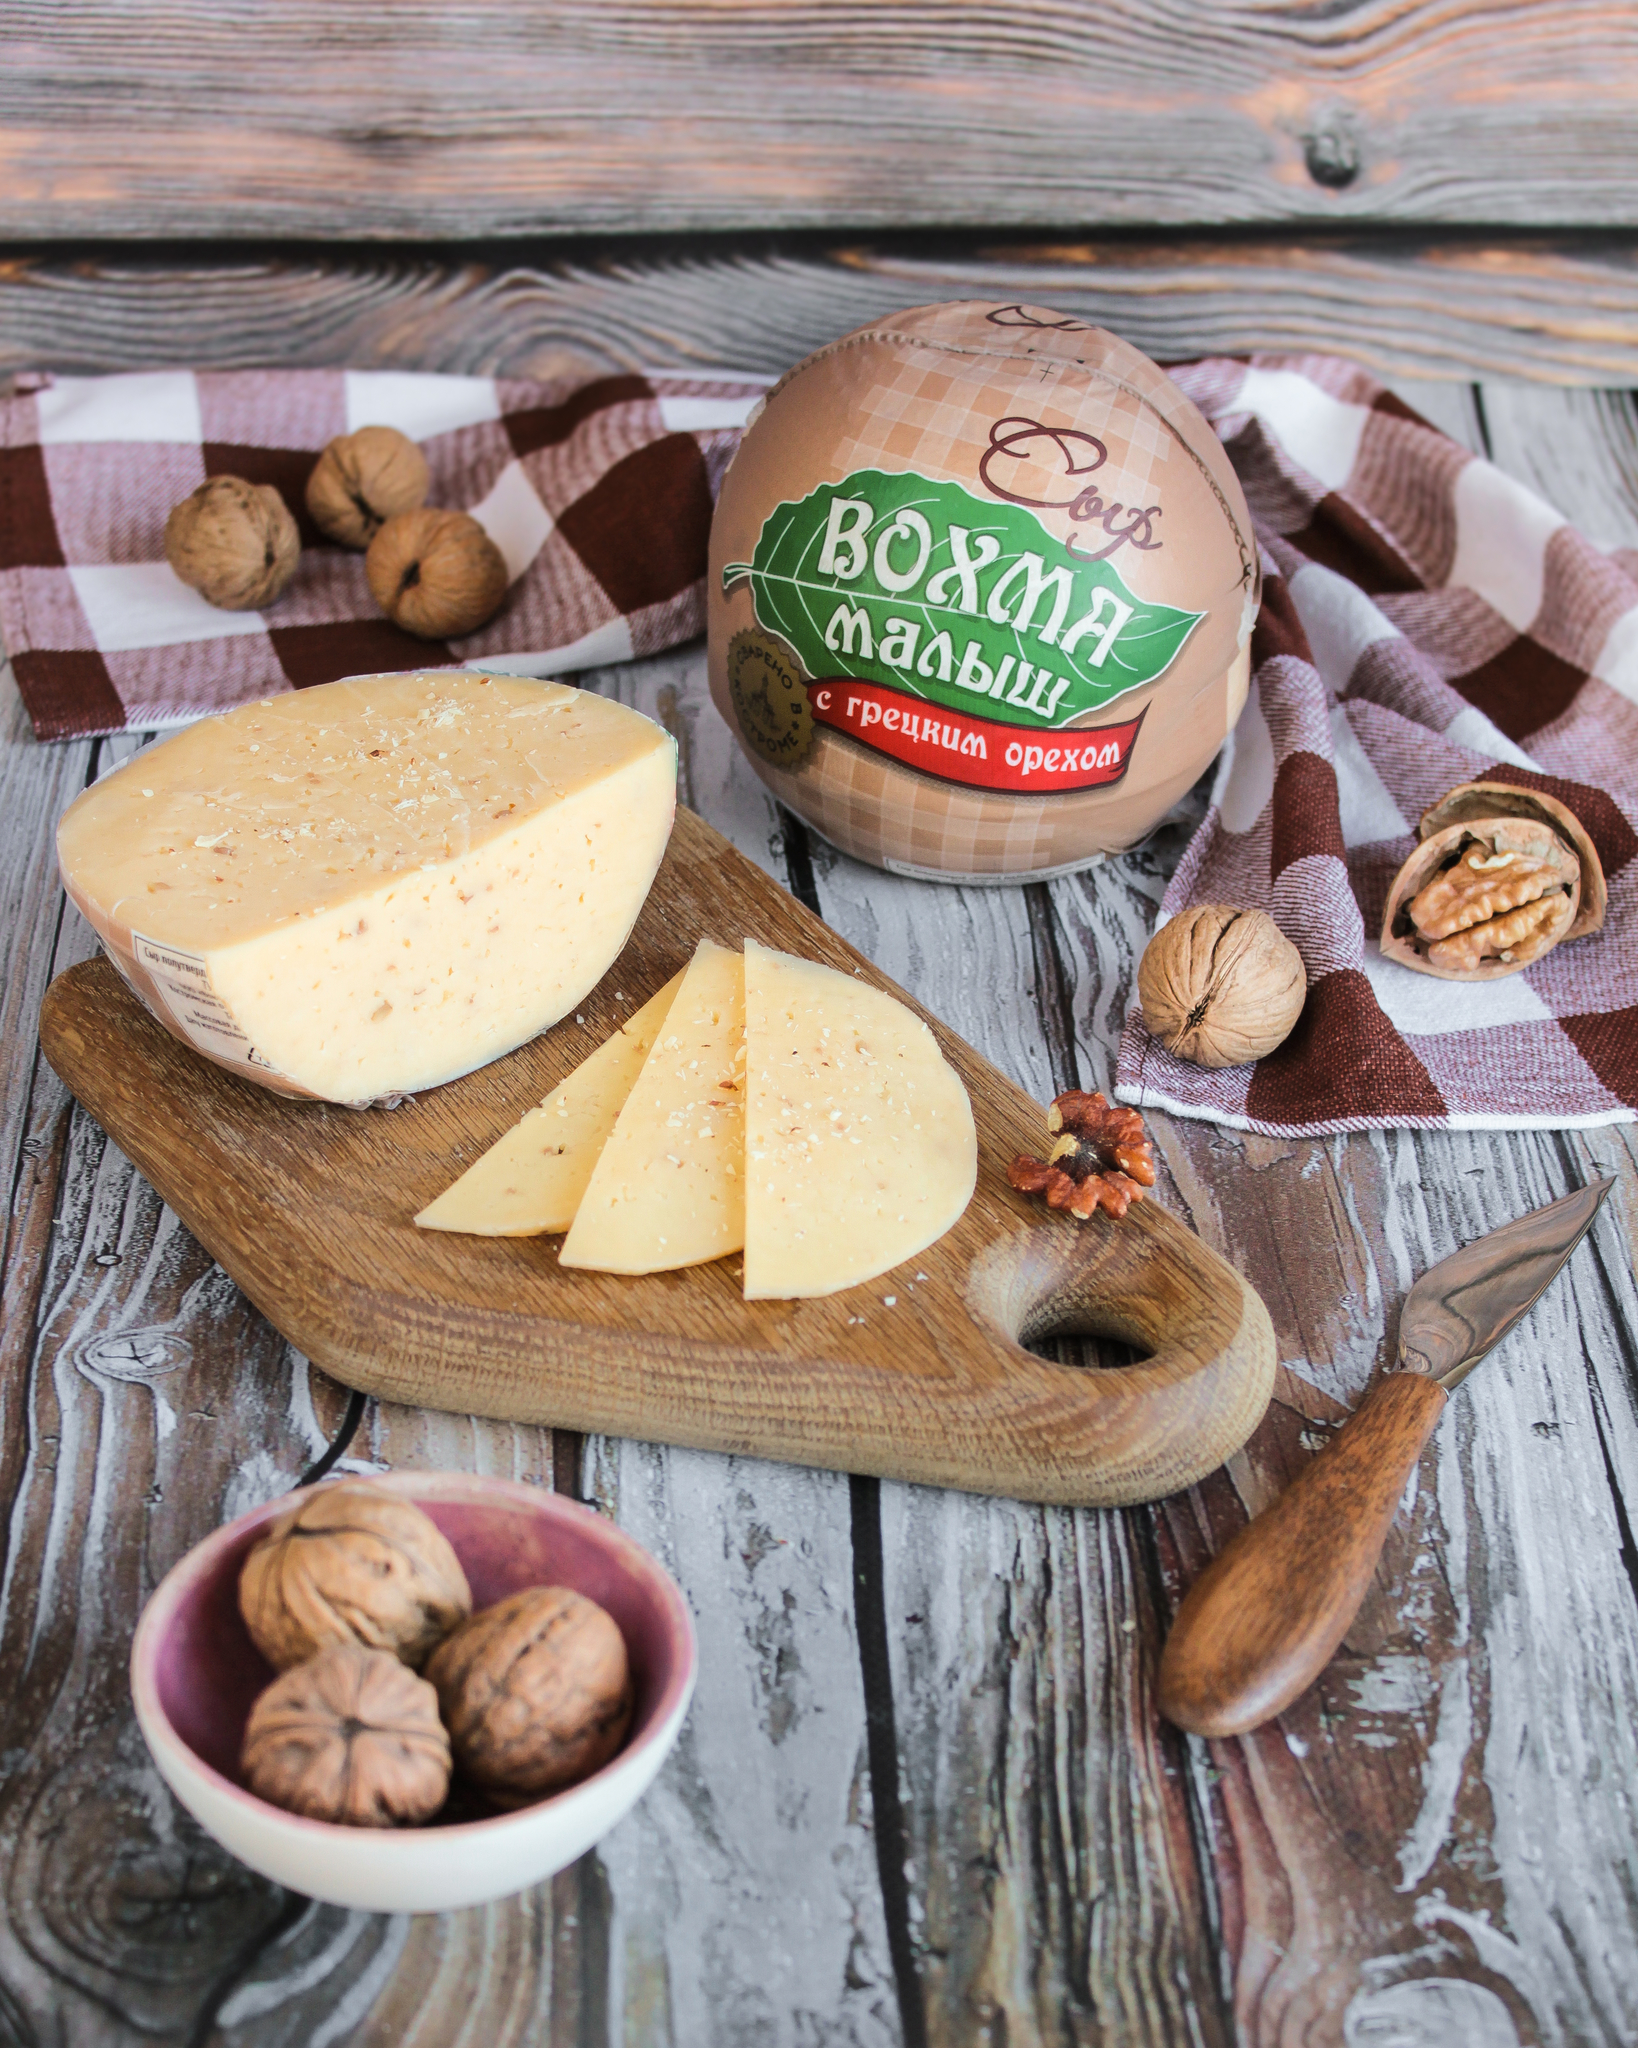 Сыр Вохма с грецким орехом, кг